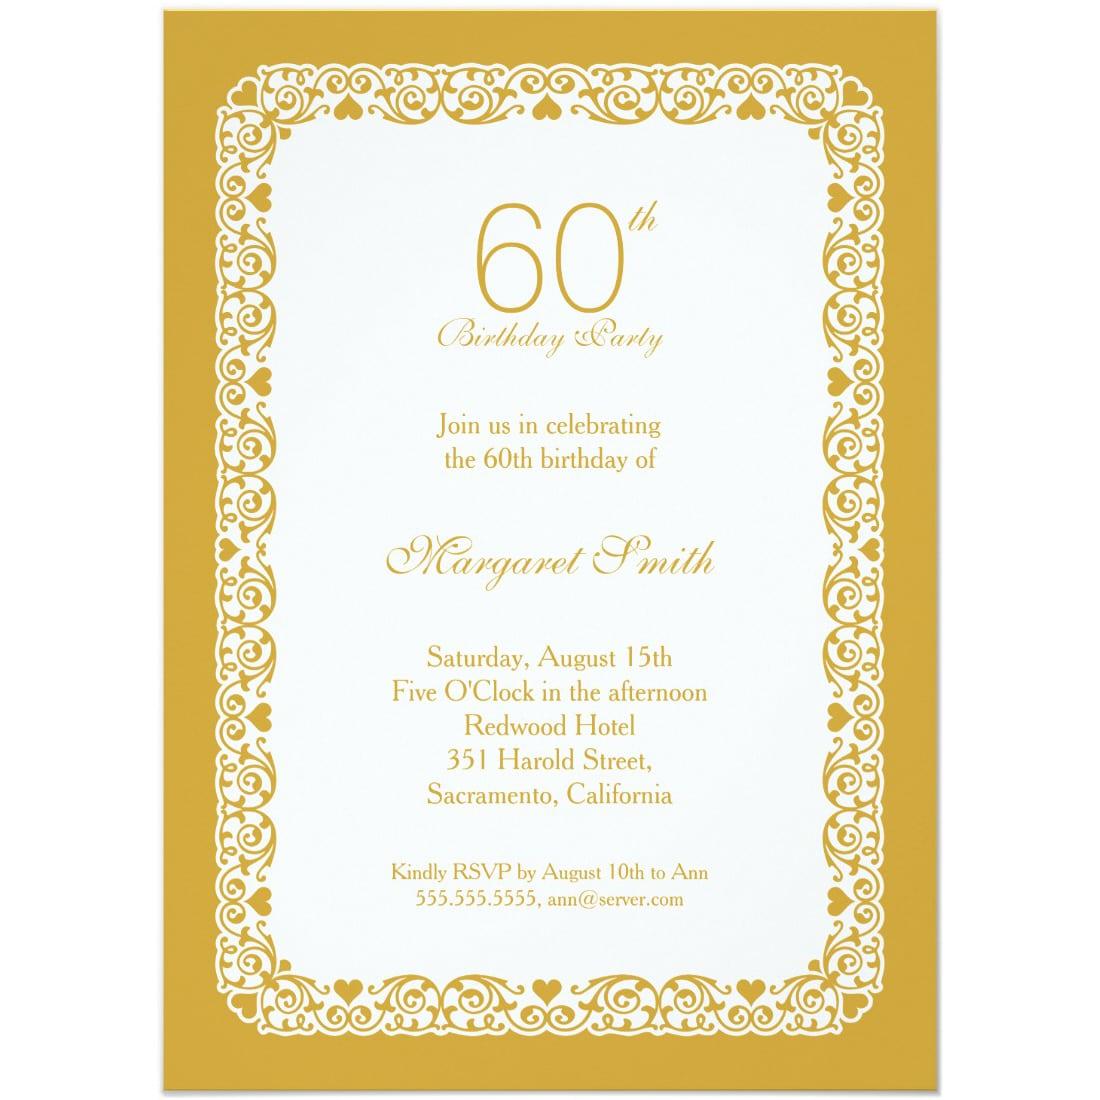 Elegant Personalized 60th Birthday Party Invitations